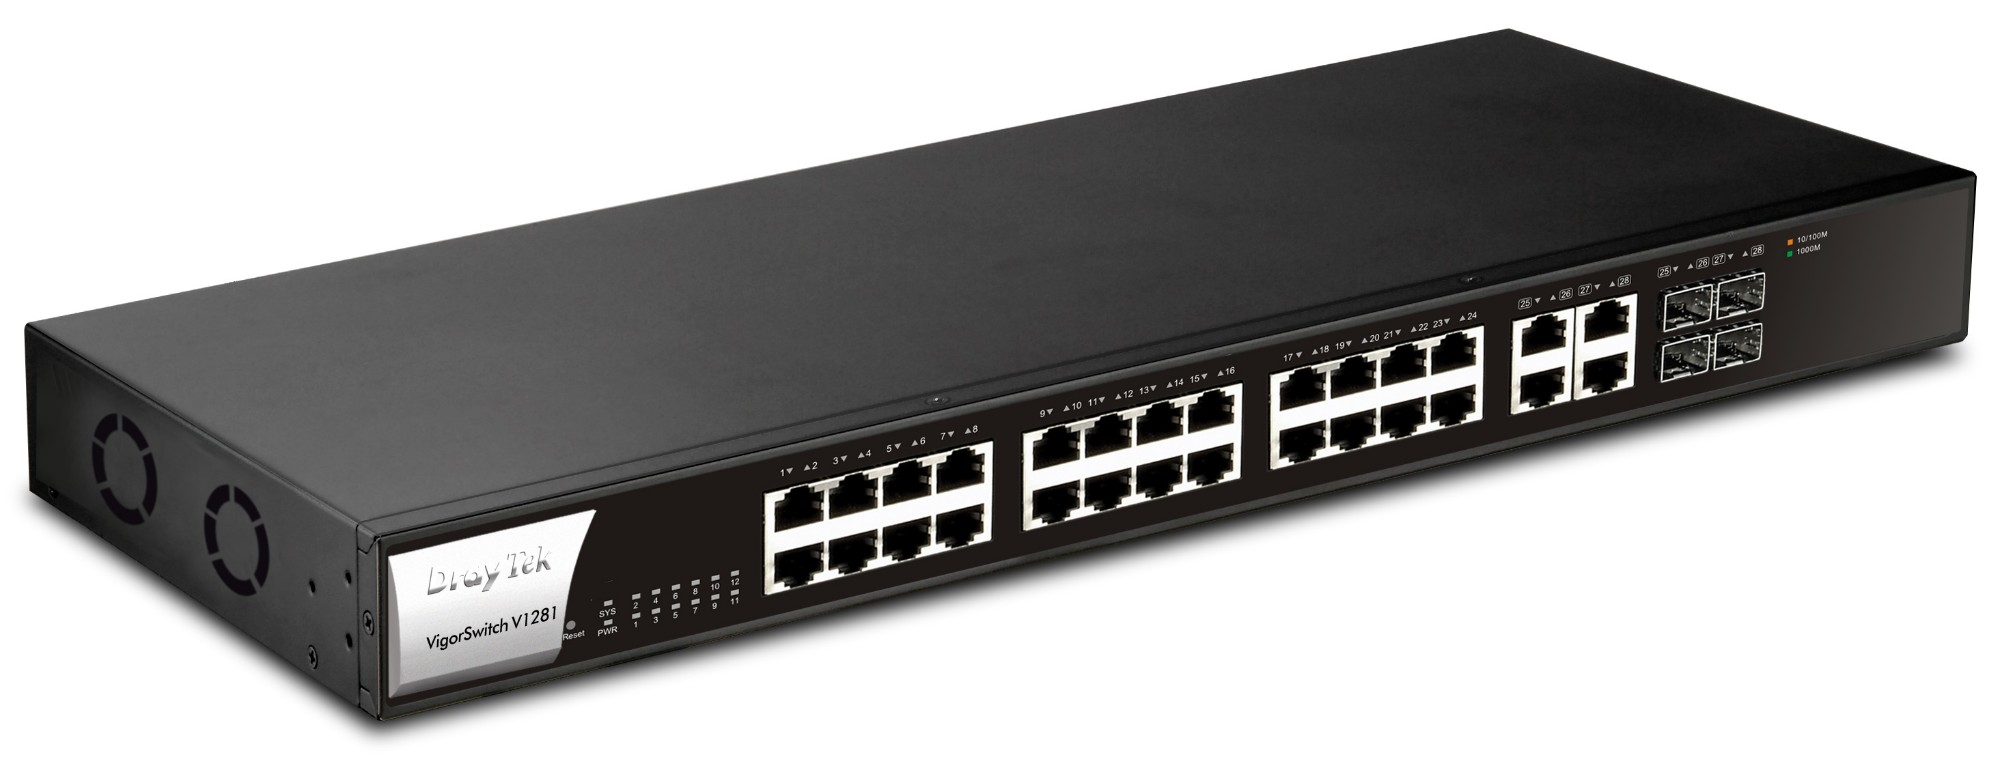 Draytek VigorSwitch V1281 Video Distribution 28 Port Ethernet switch for switching IP video distribution sou